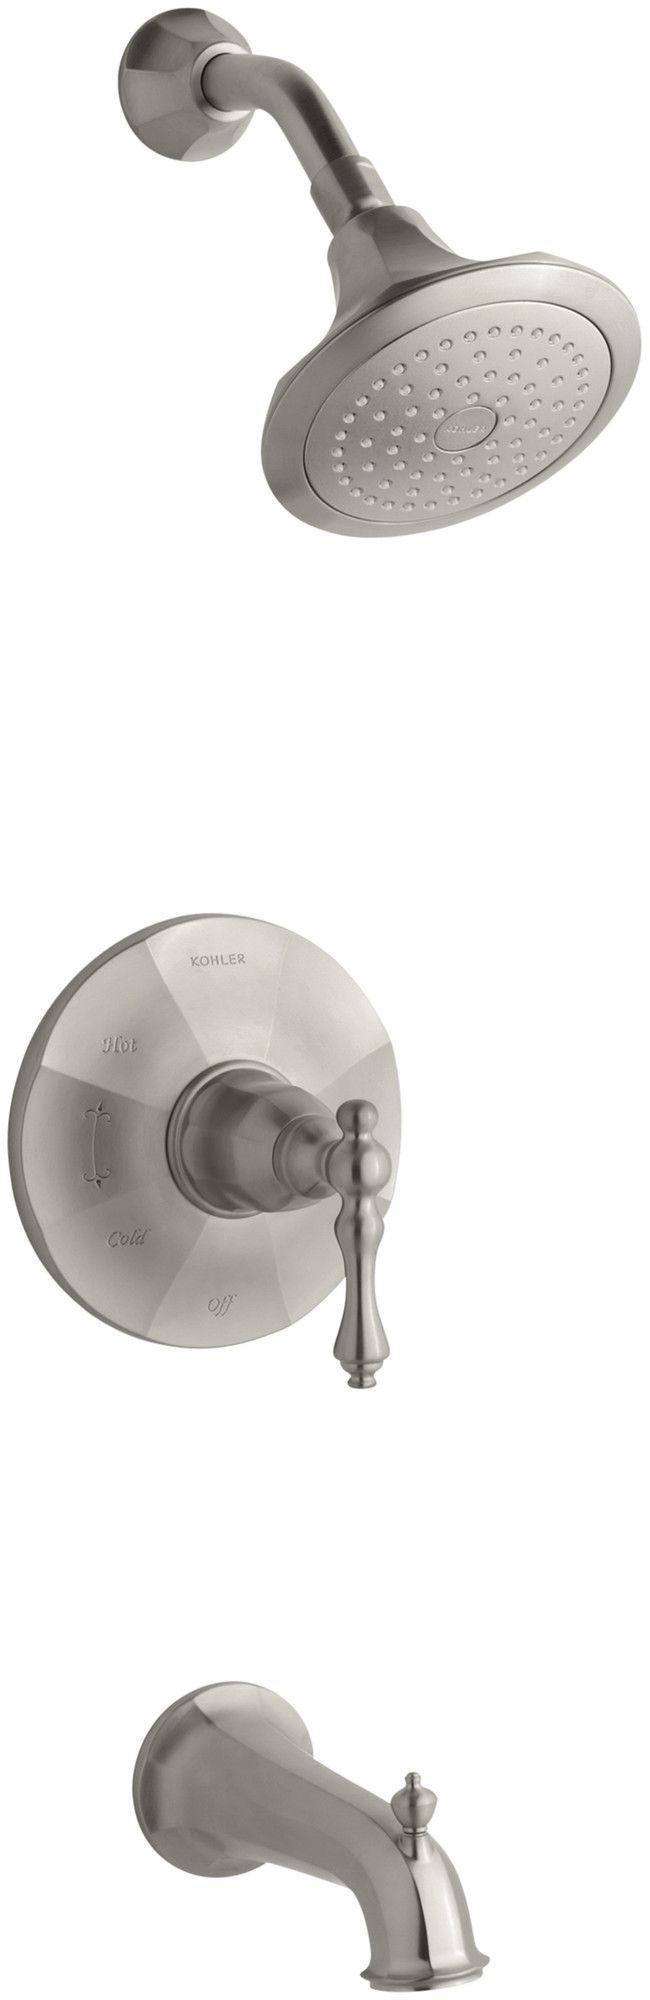 Kelston Rite-Temp Pressure-Balancing Bath and Shower Faucet Trim